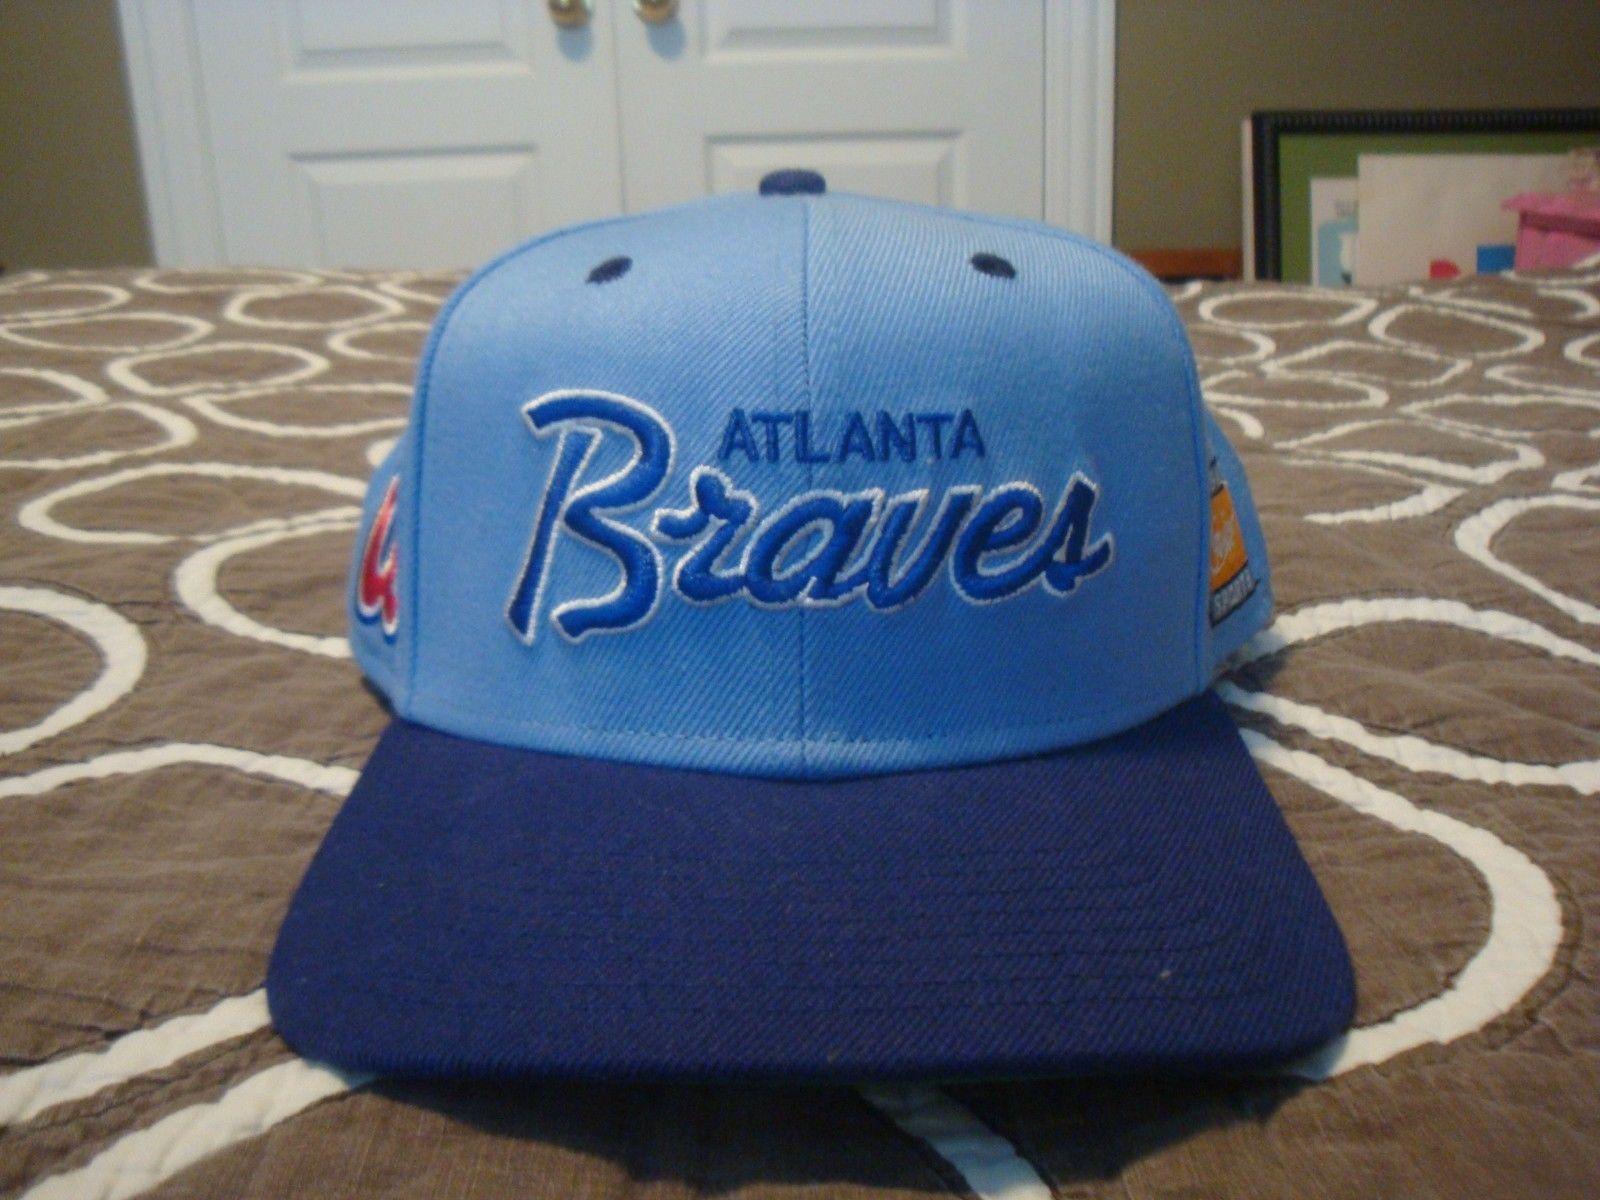 Vtg Style Atlanta Braves Snapback Hat Cap Nike Script Light Blue Retro 90s 80s Snapback Hats Atlanta Braves Braves